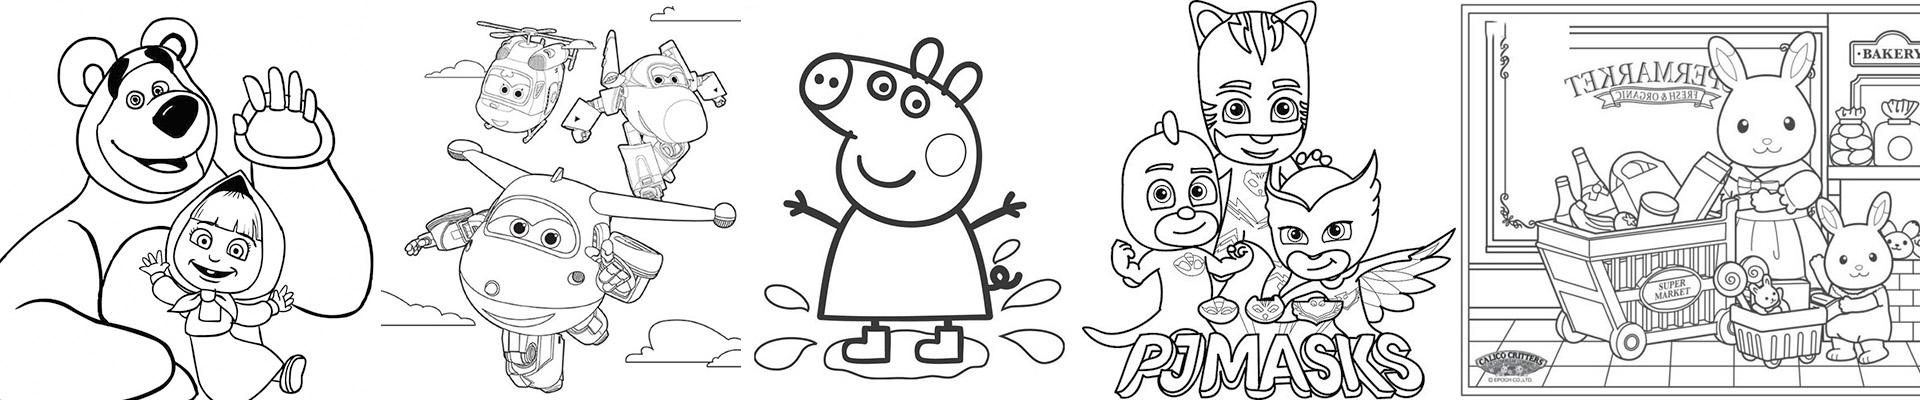 Dibujos Para Colorear Personajes Series Infantiles 100